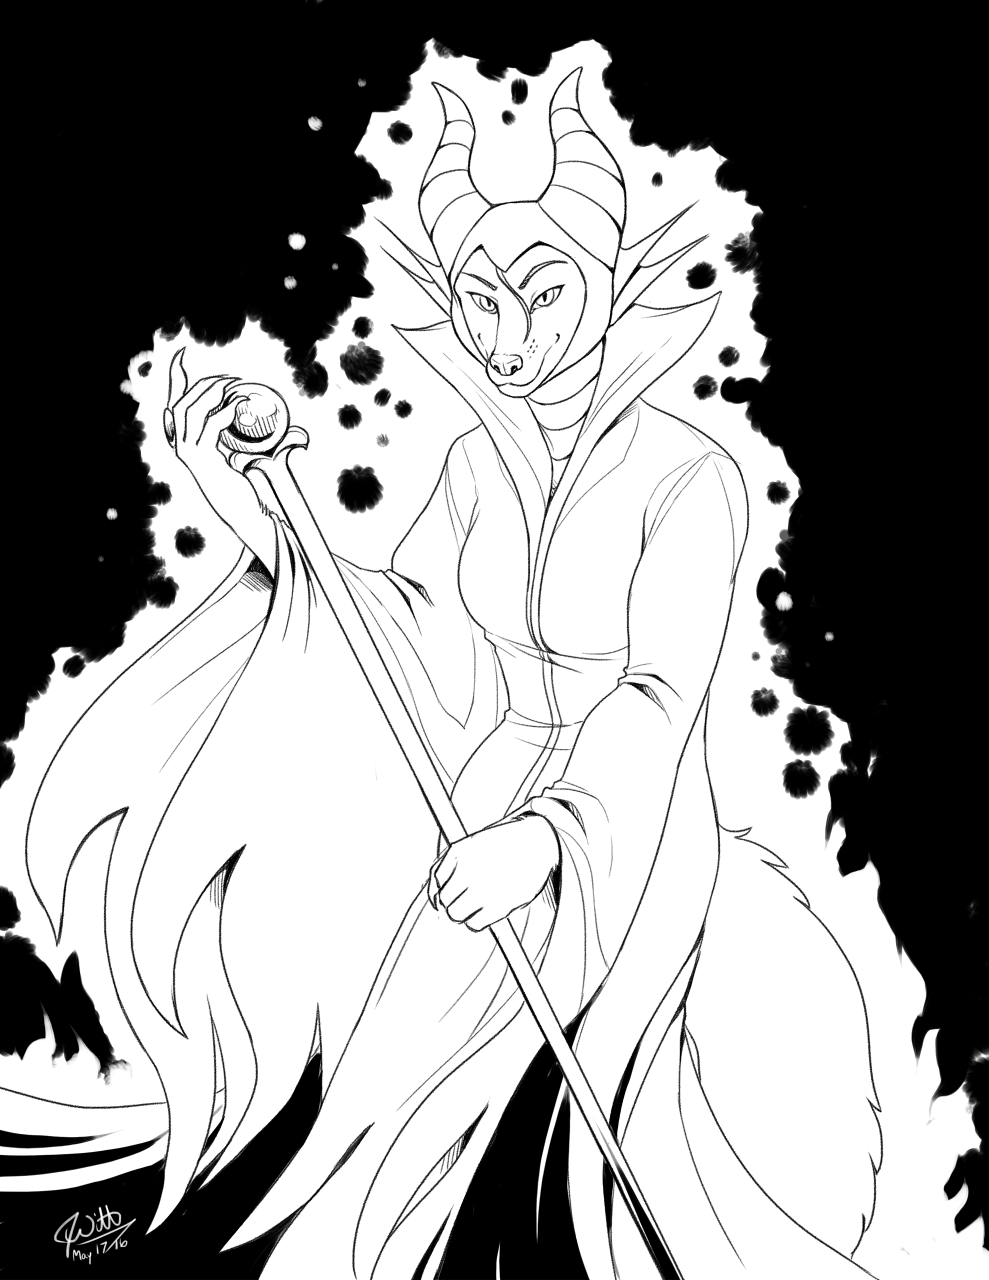 Inked Cosplay - Freya as Maleficent